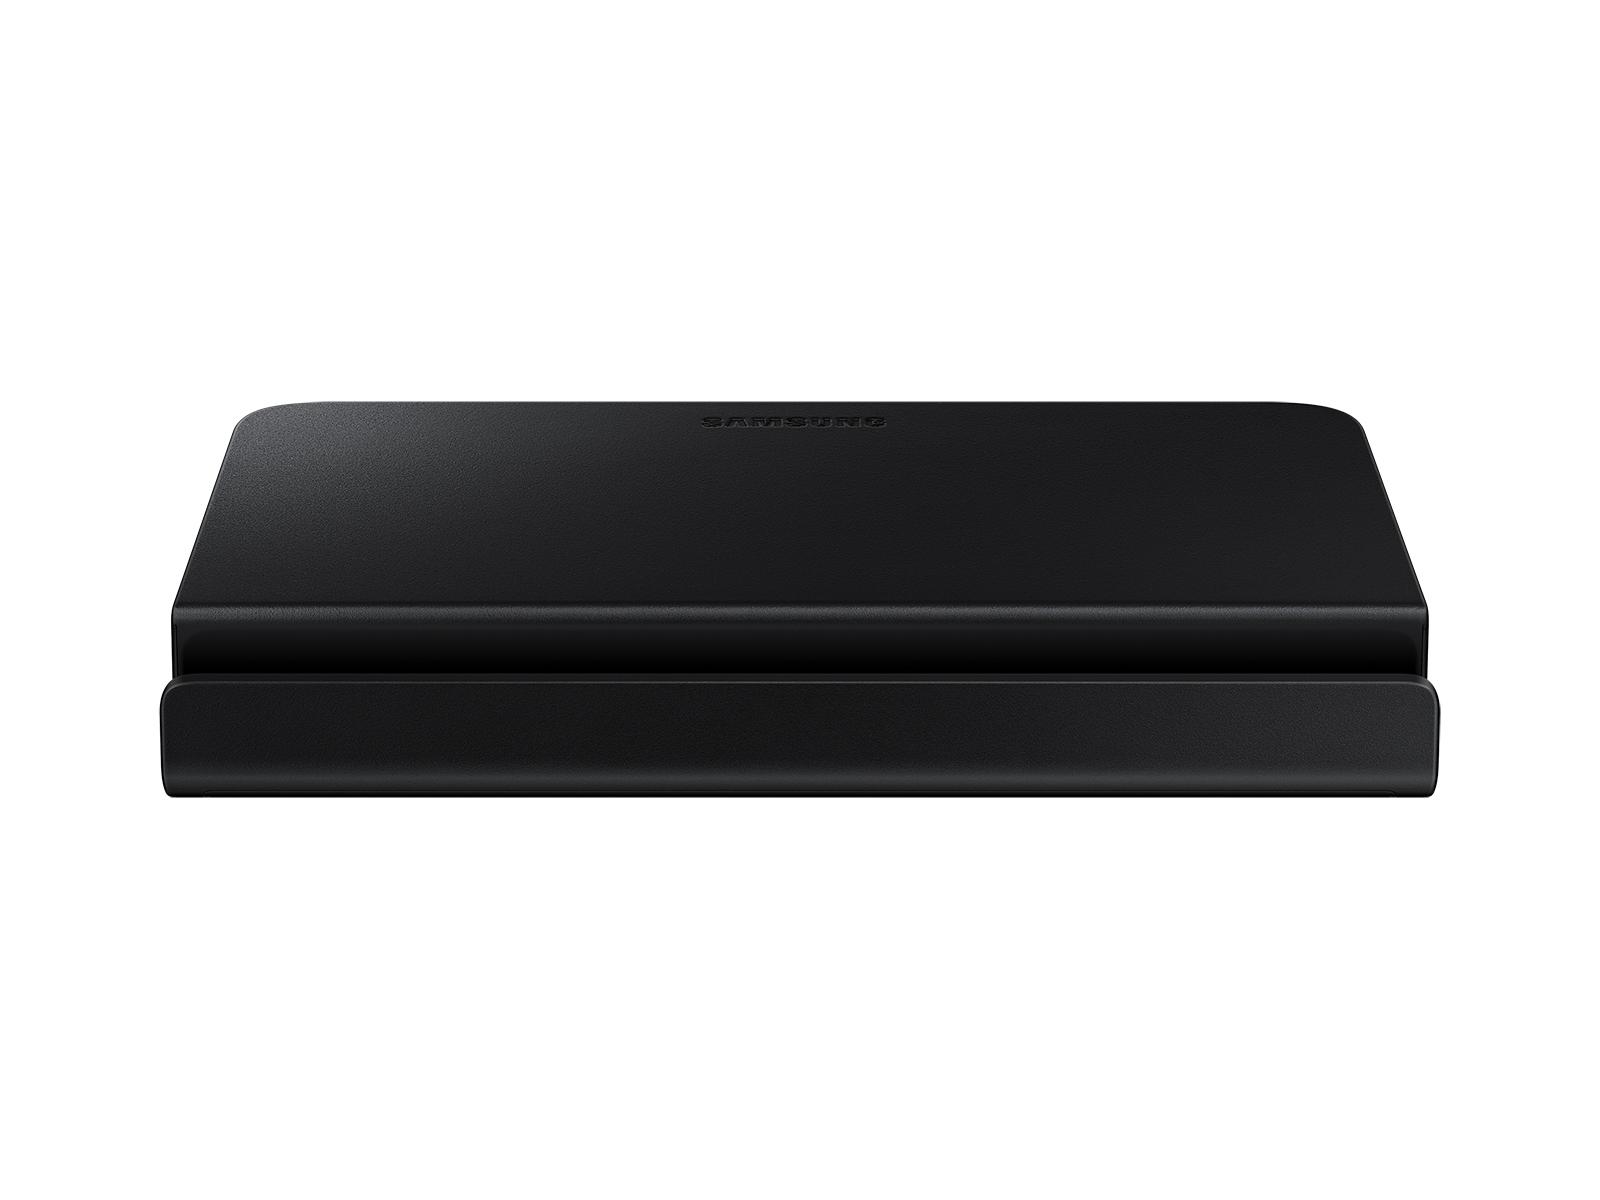 "Galaxy Tab S4 & Tab A 10.5"" Charging Dock Pogo"